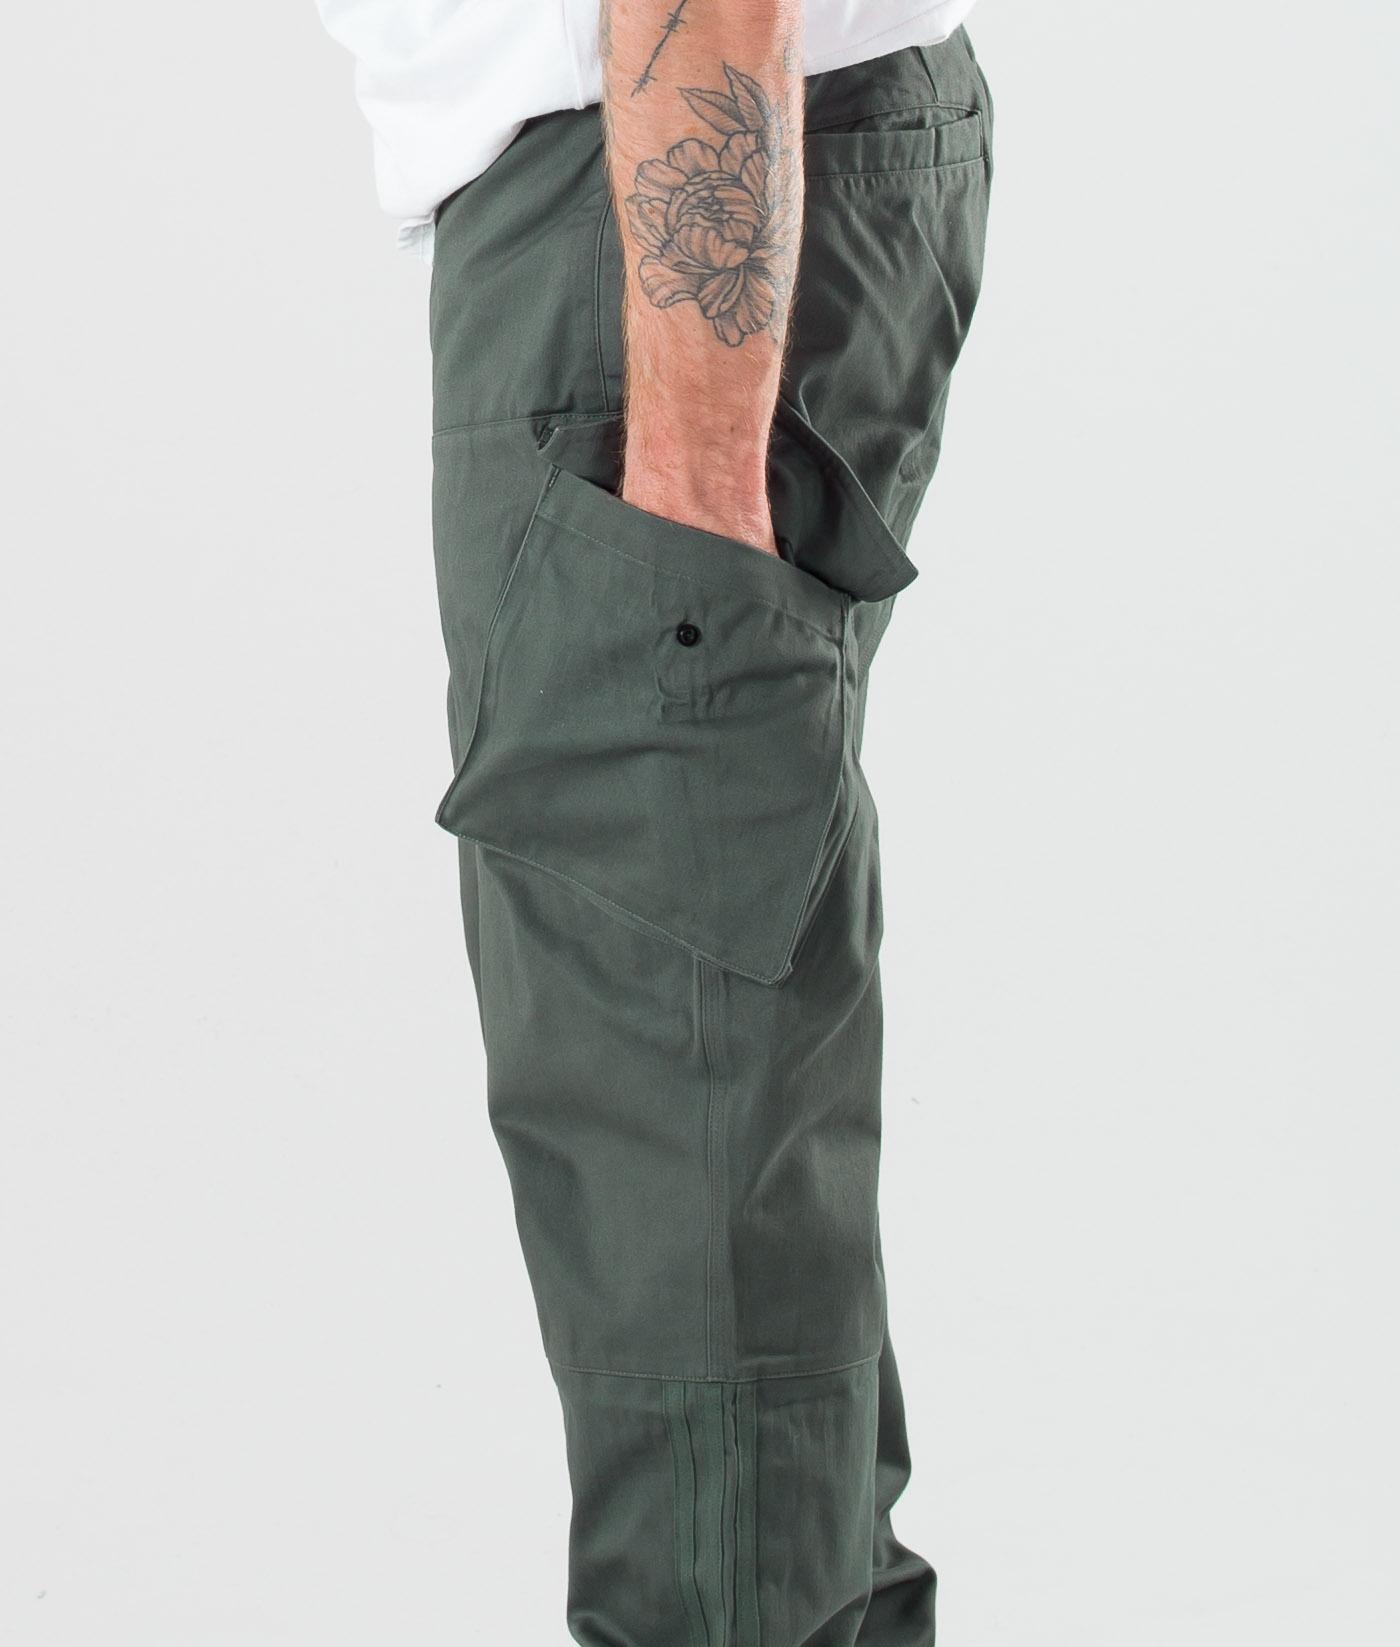 Adidas Skateboarding Cargo Pants Legend Ivy